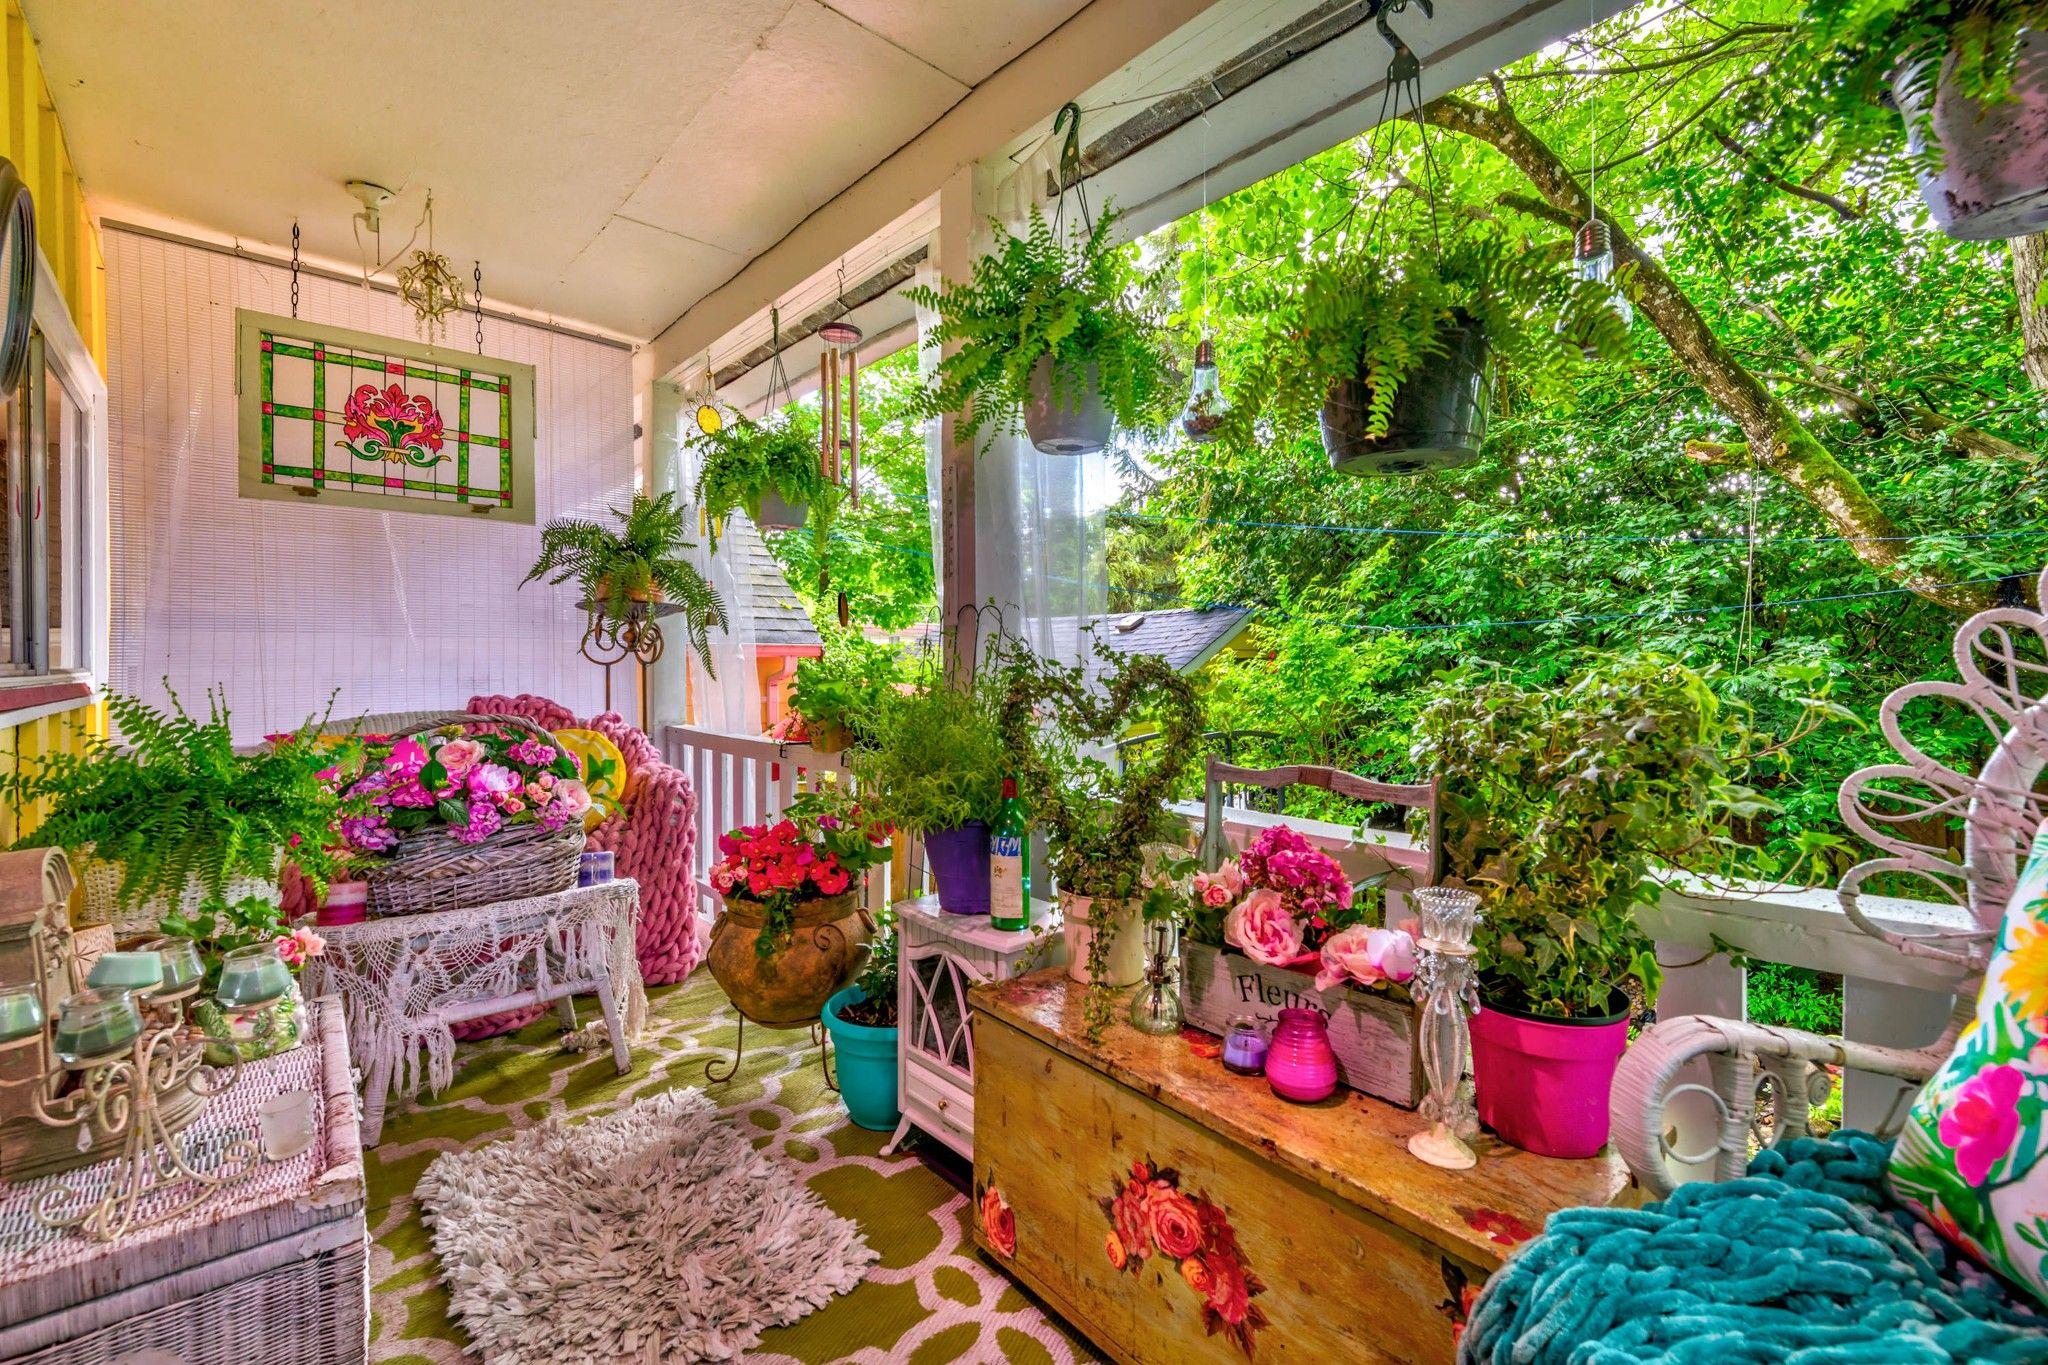 Photo 21: Photos: 20623 114 Avenue in Maple Ridge: Southwest Maple Ridge House for sale : MLS®# R2465656